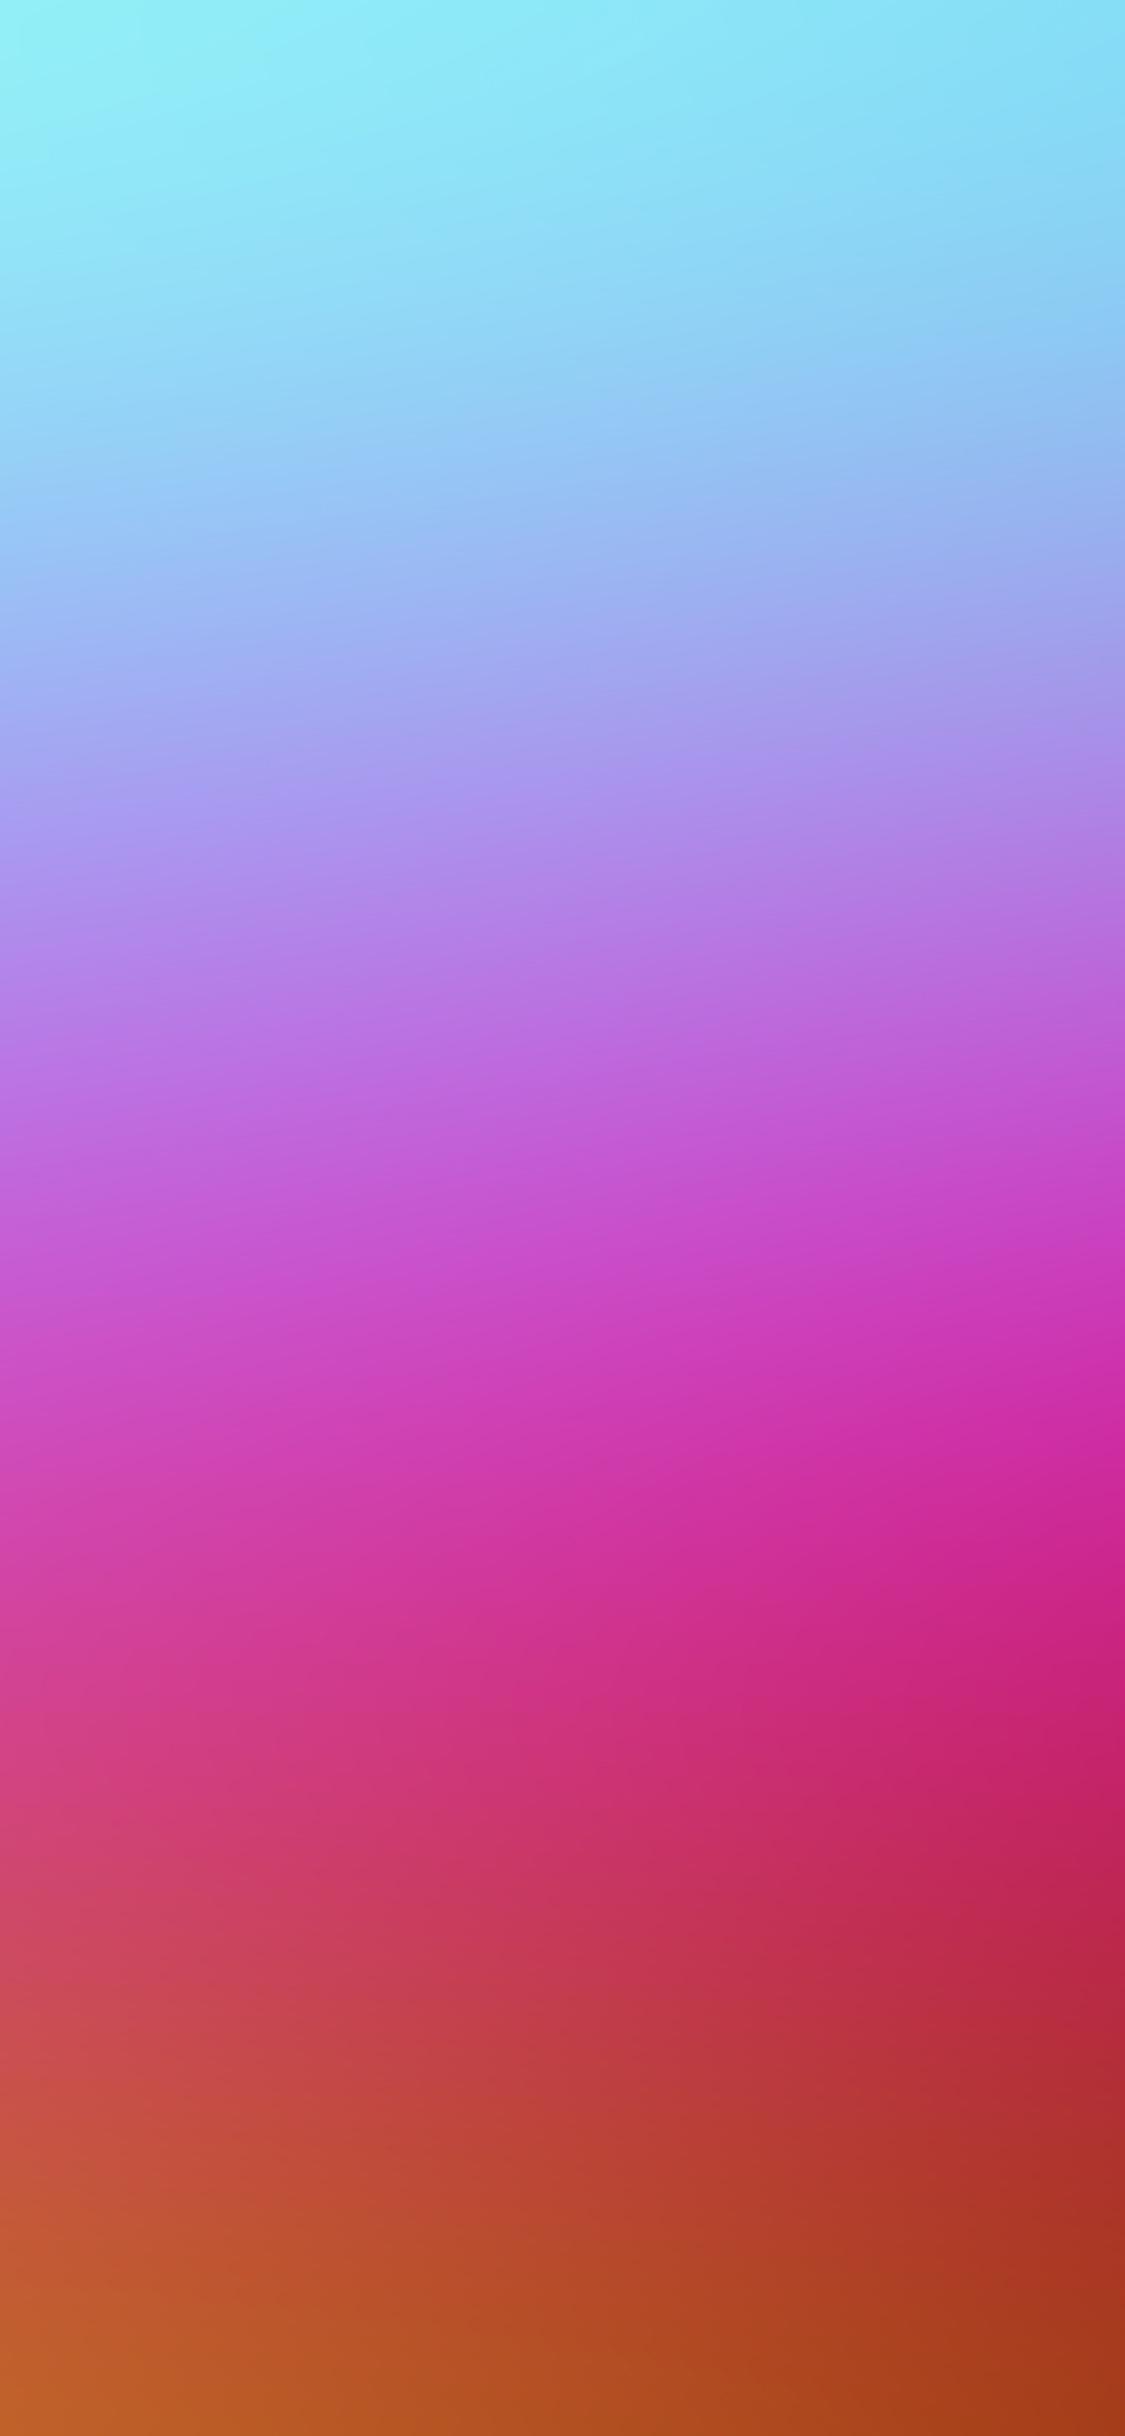 iPhoneXpapers.com-Apple-iPhone-wallpaper-sg55-kuk-hyum-color-gradation-blur